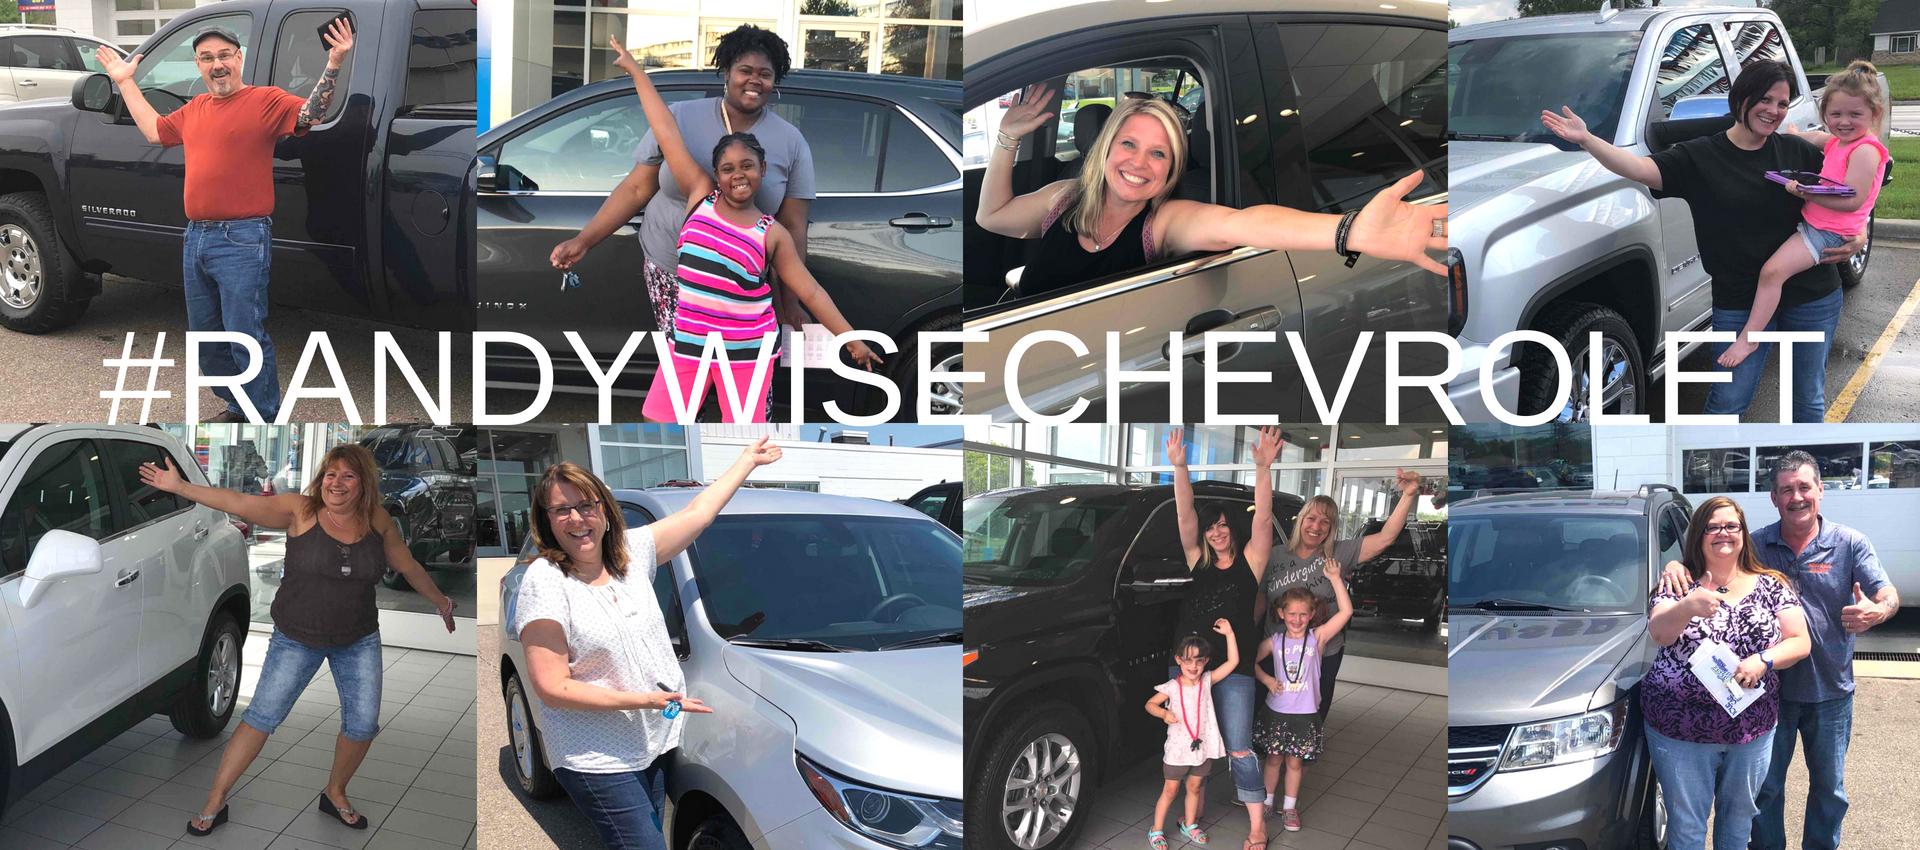 Randy Wise Chevrolet is a Flint Chevrolet dealer and a new ... | randy wise chevrolet flint mi